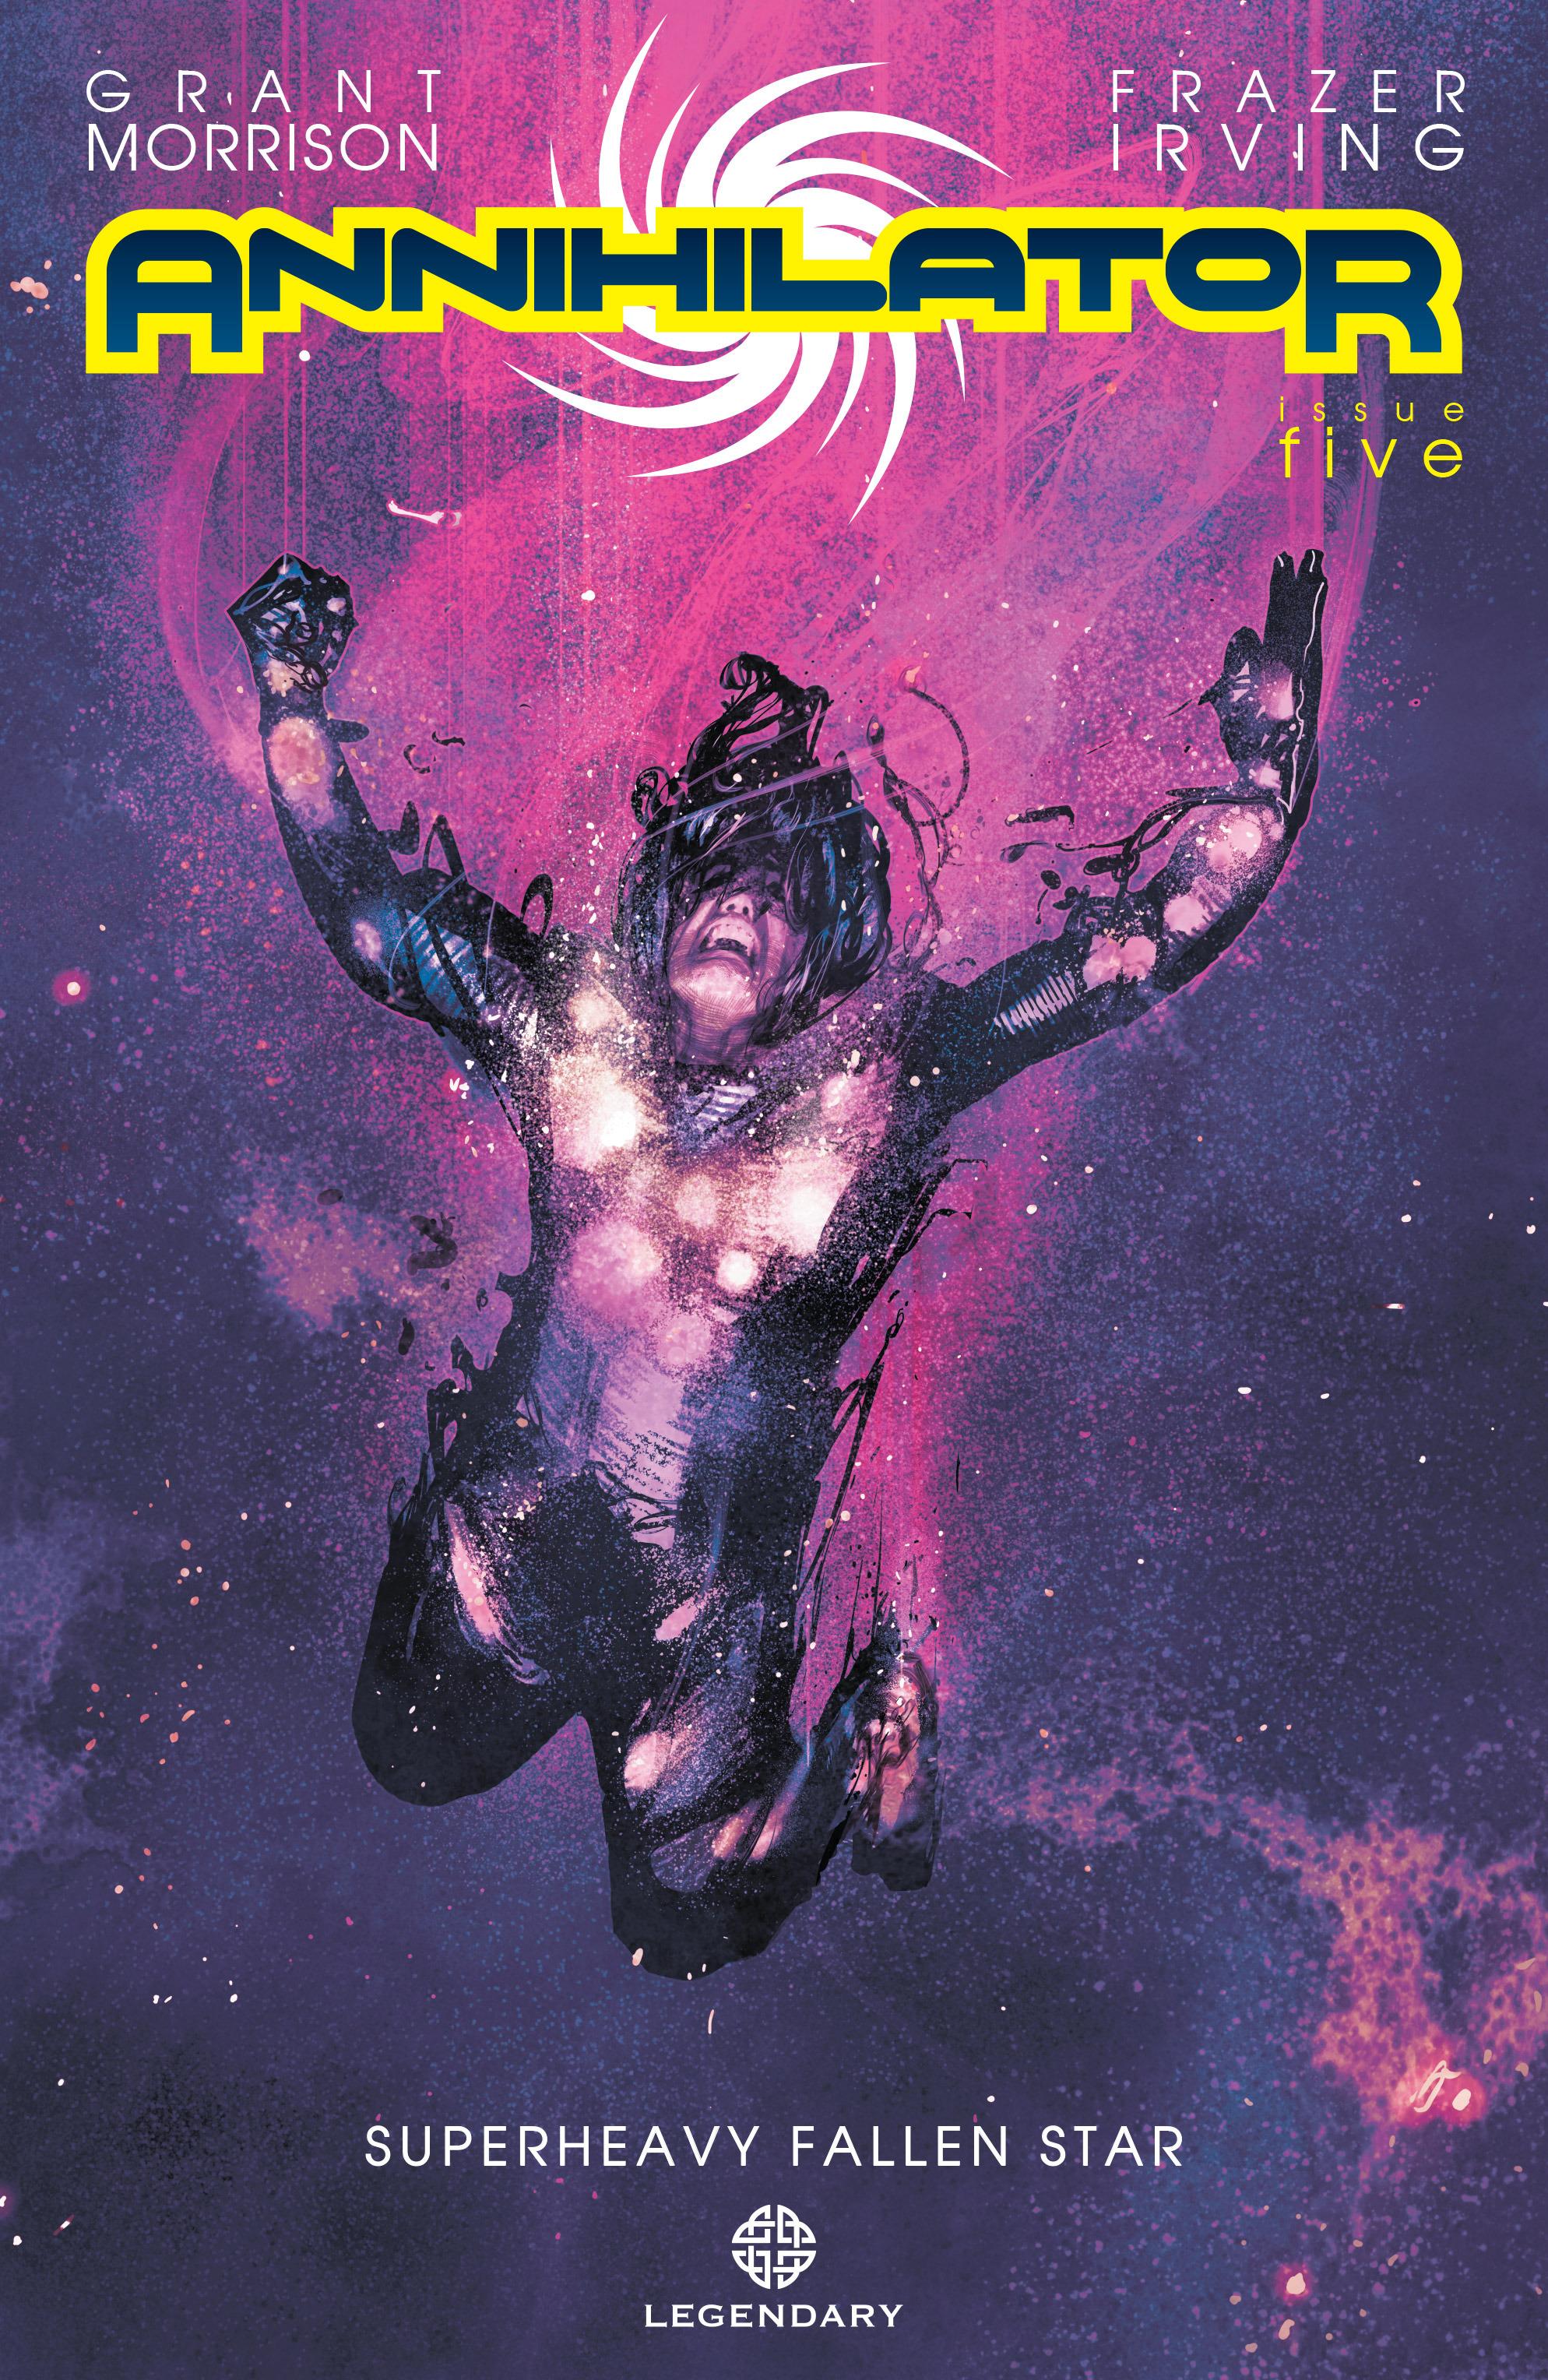 Read online Annihilator comic -  Issue #5 - 1